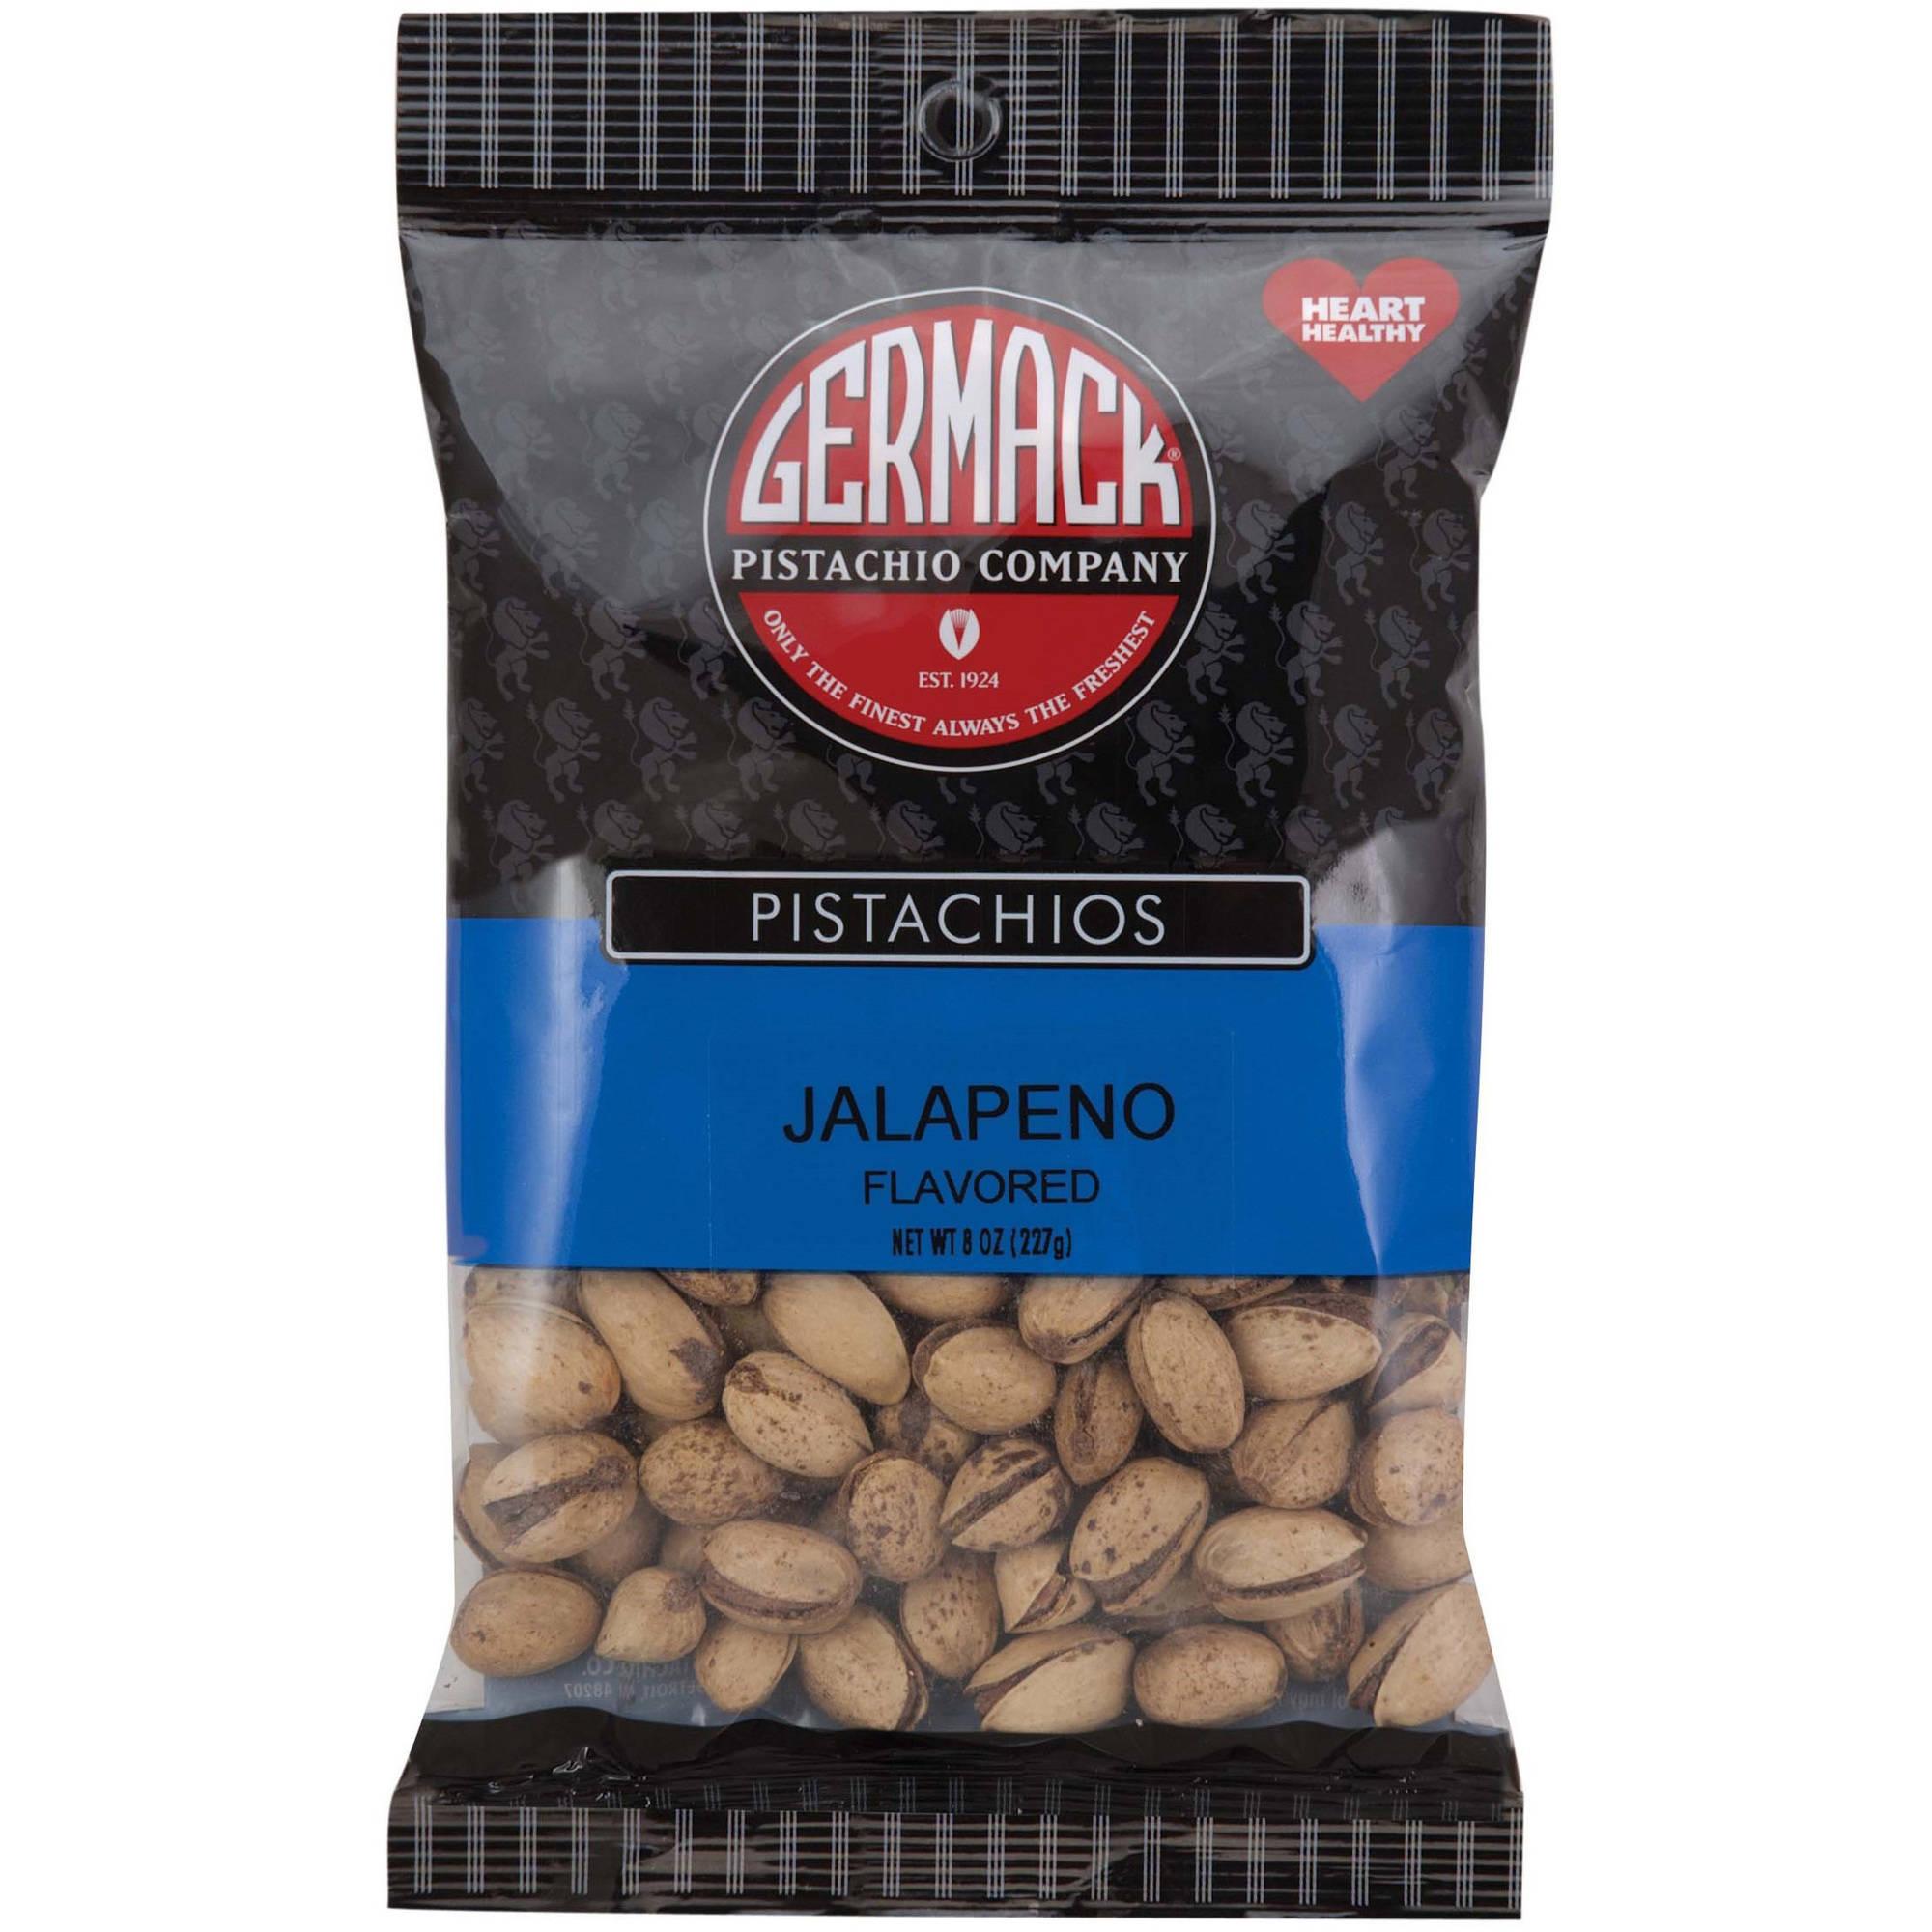 Germack Pistachio Company Jalapeno Flavored Pistachios, 8 oz by GERMACK